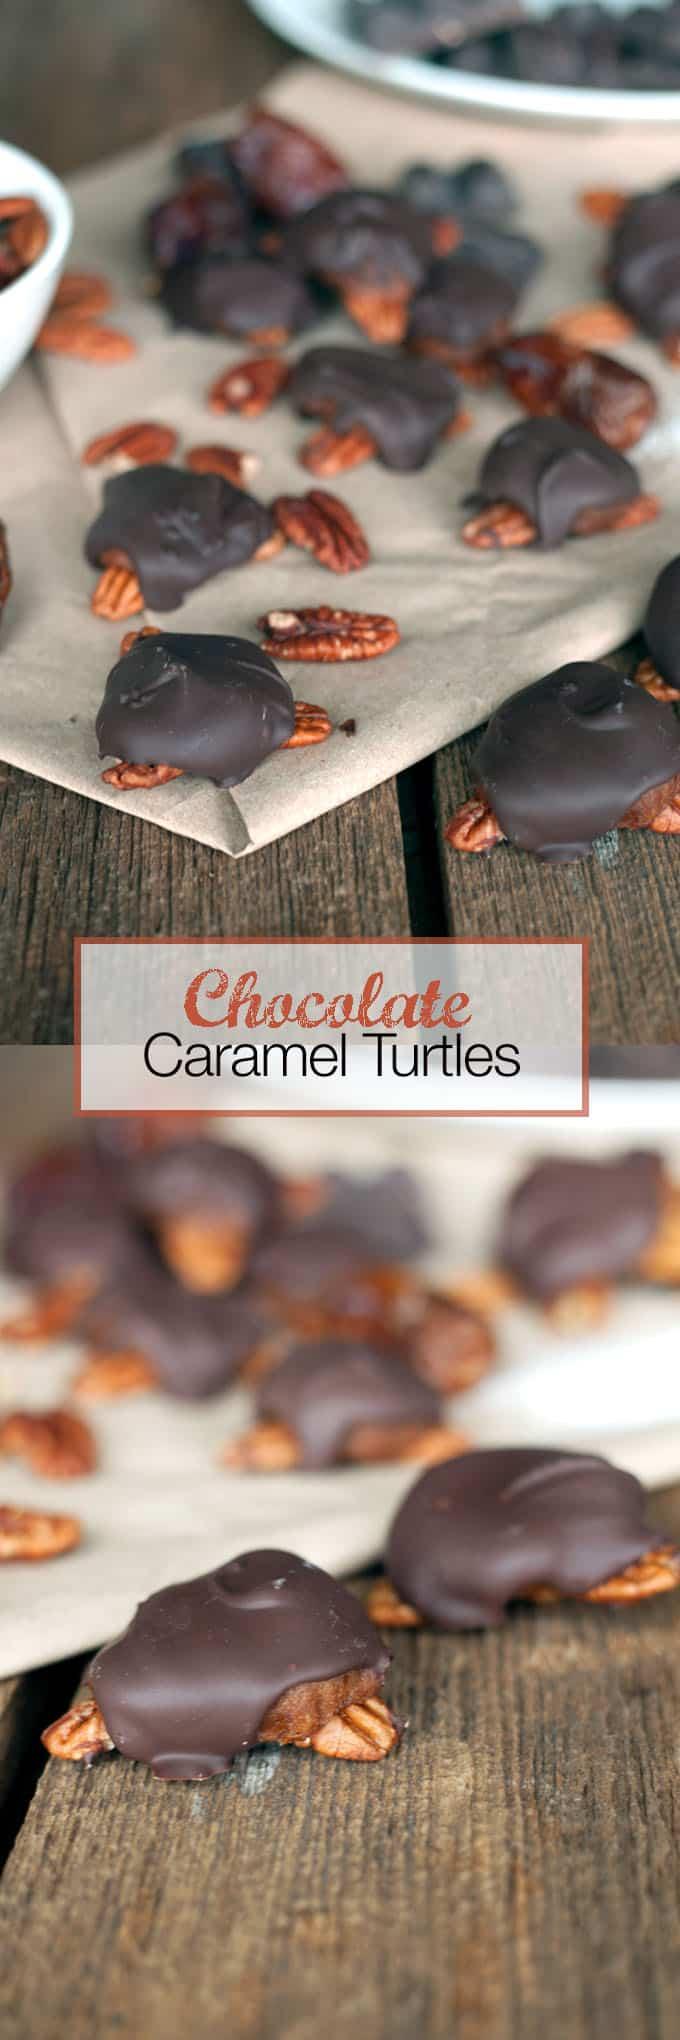 Chocolate Covered Turtles Recipe VEGAN | The Edgy Veg